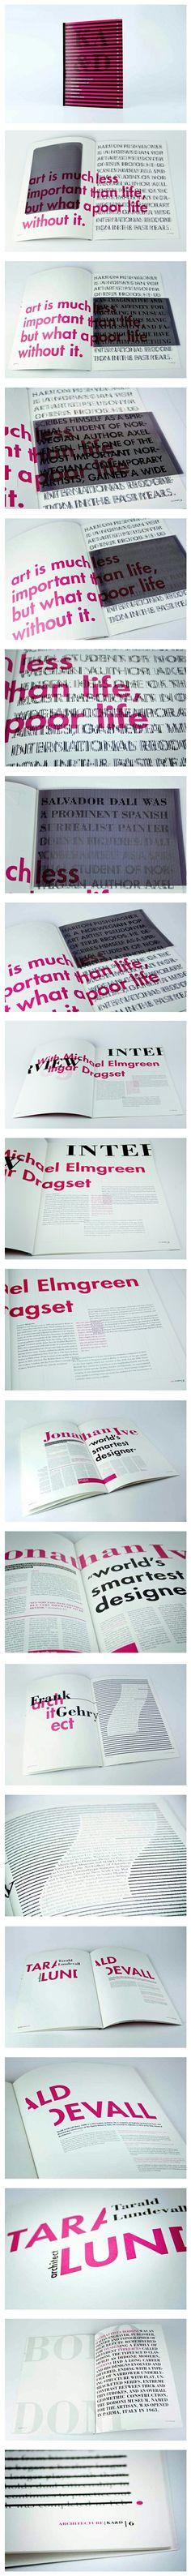 KA typographic magazine